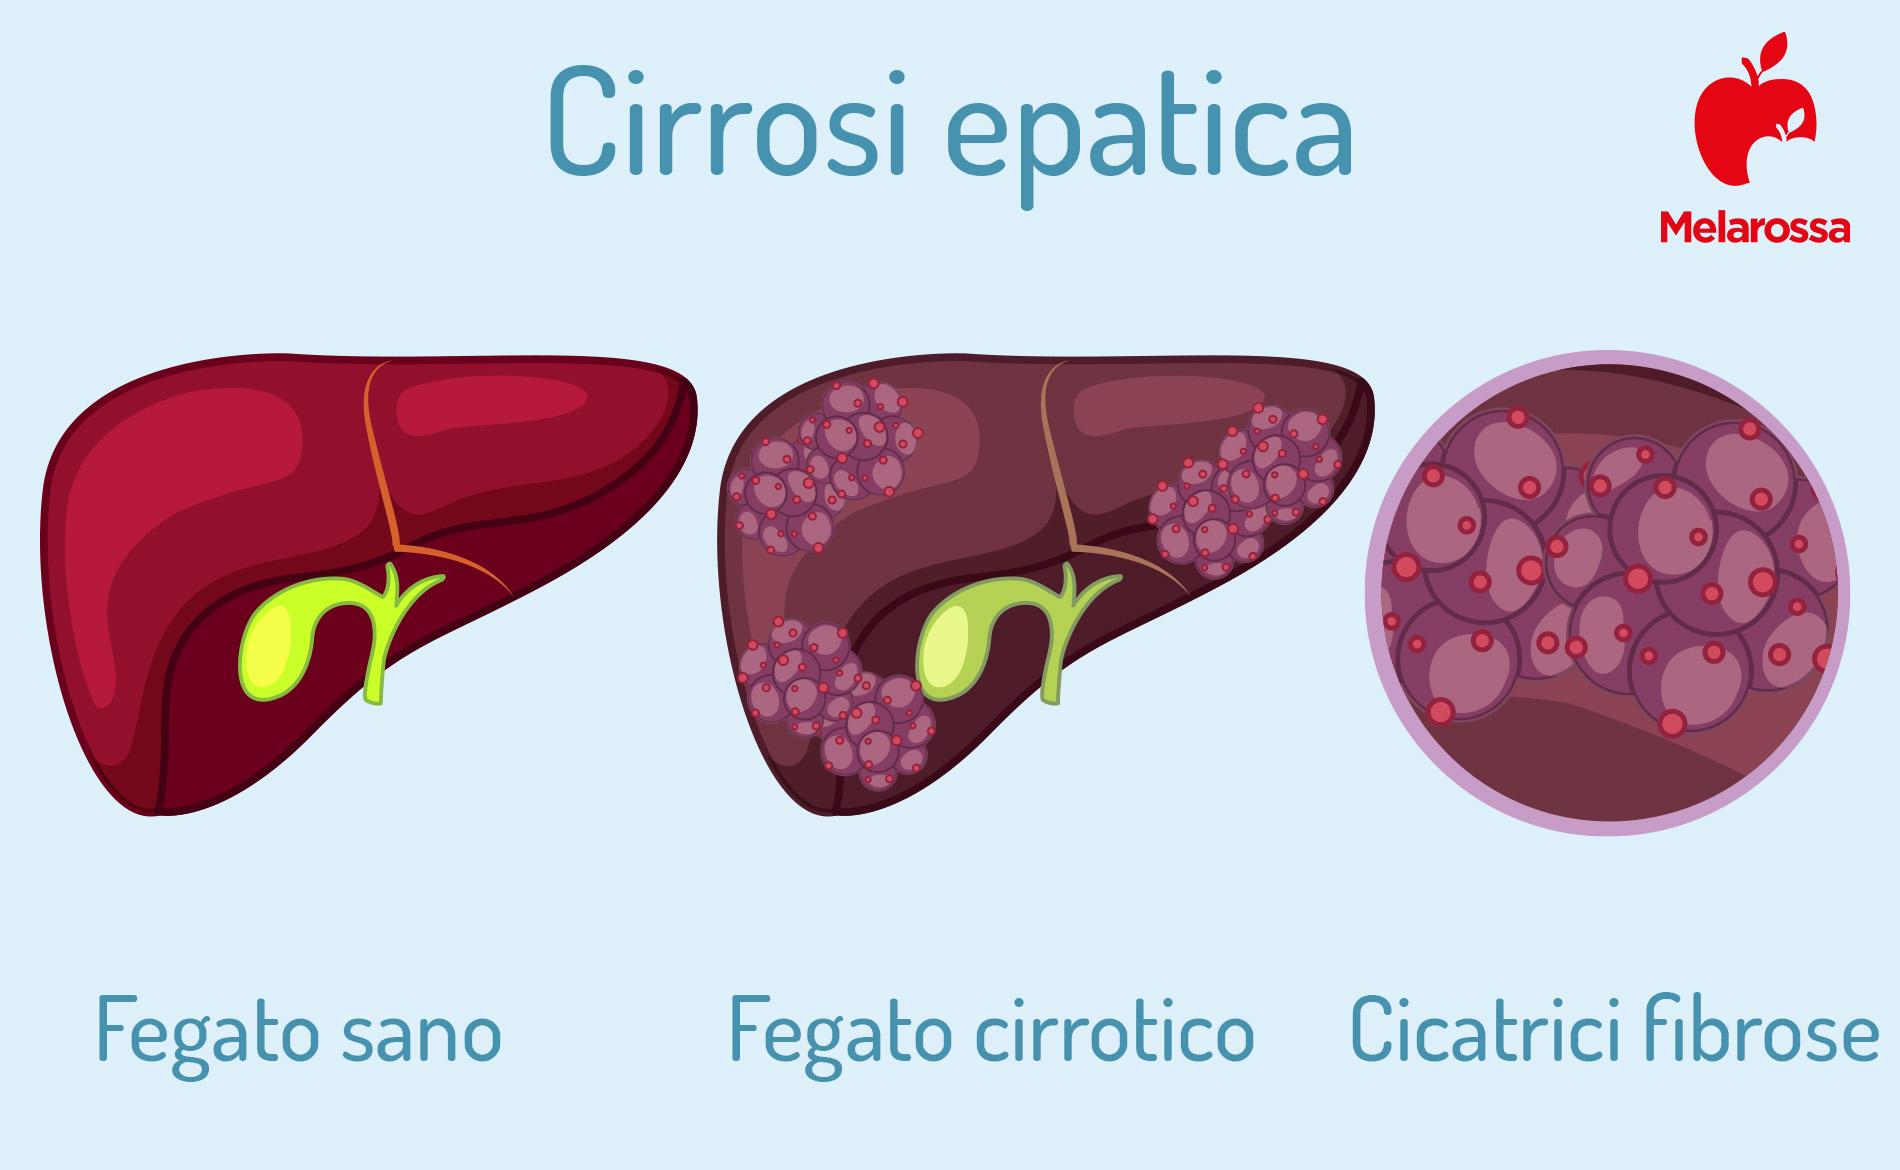 cirrosi epatica: cause